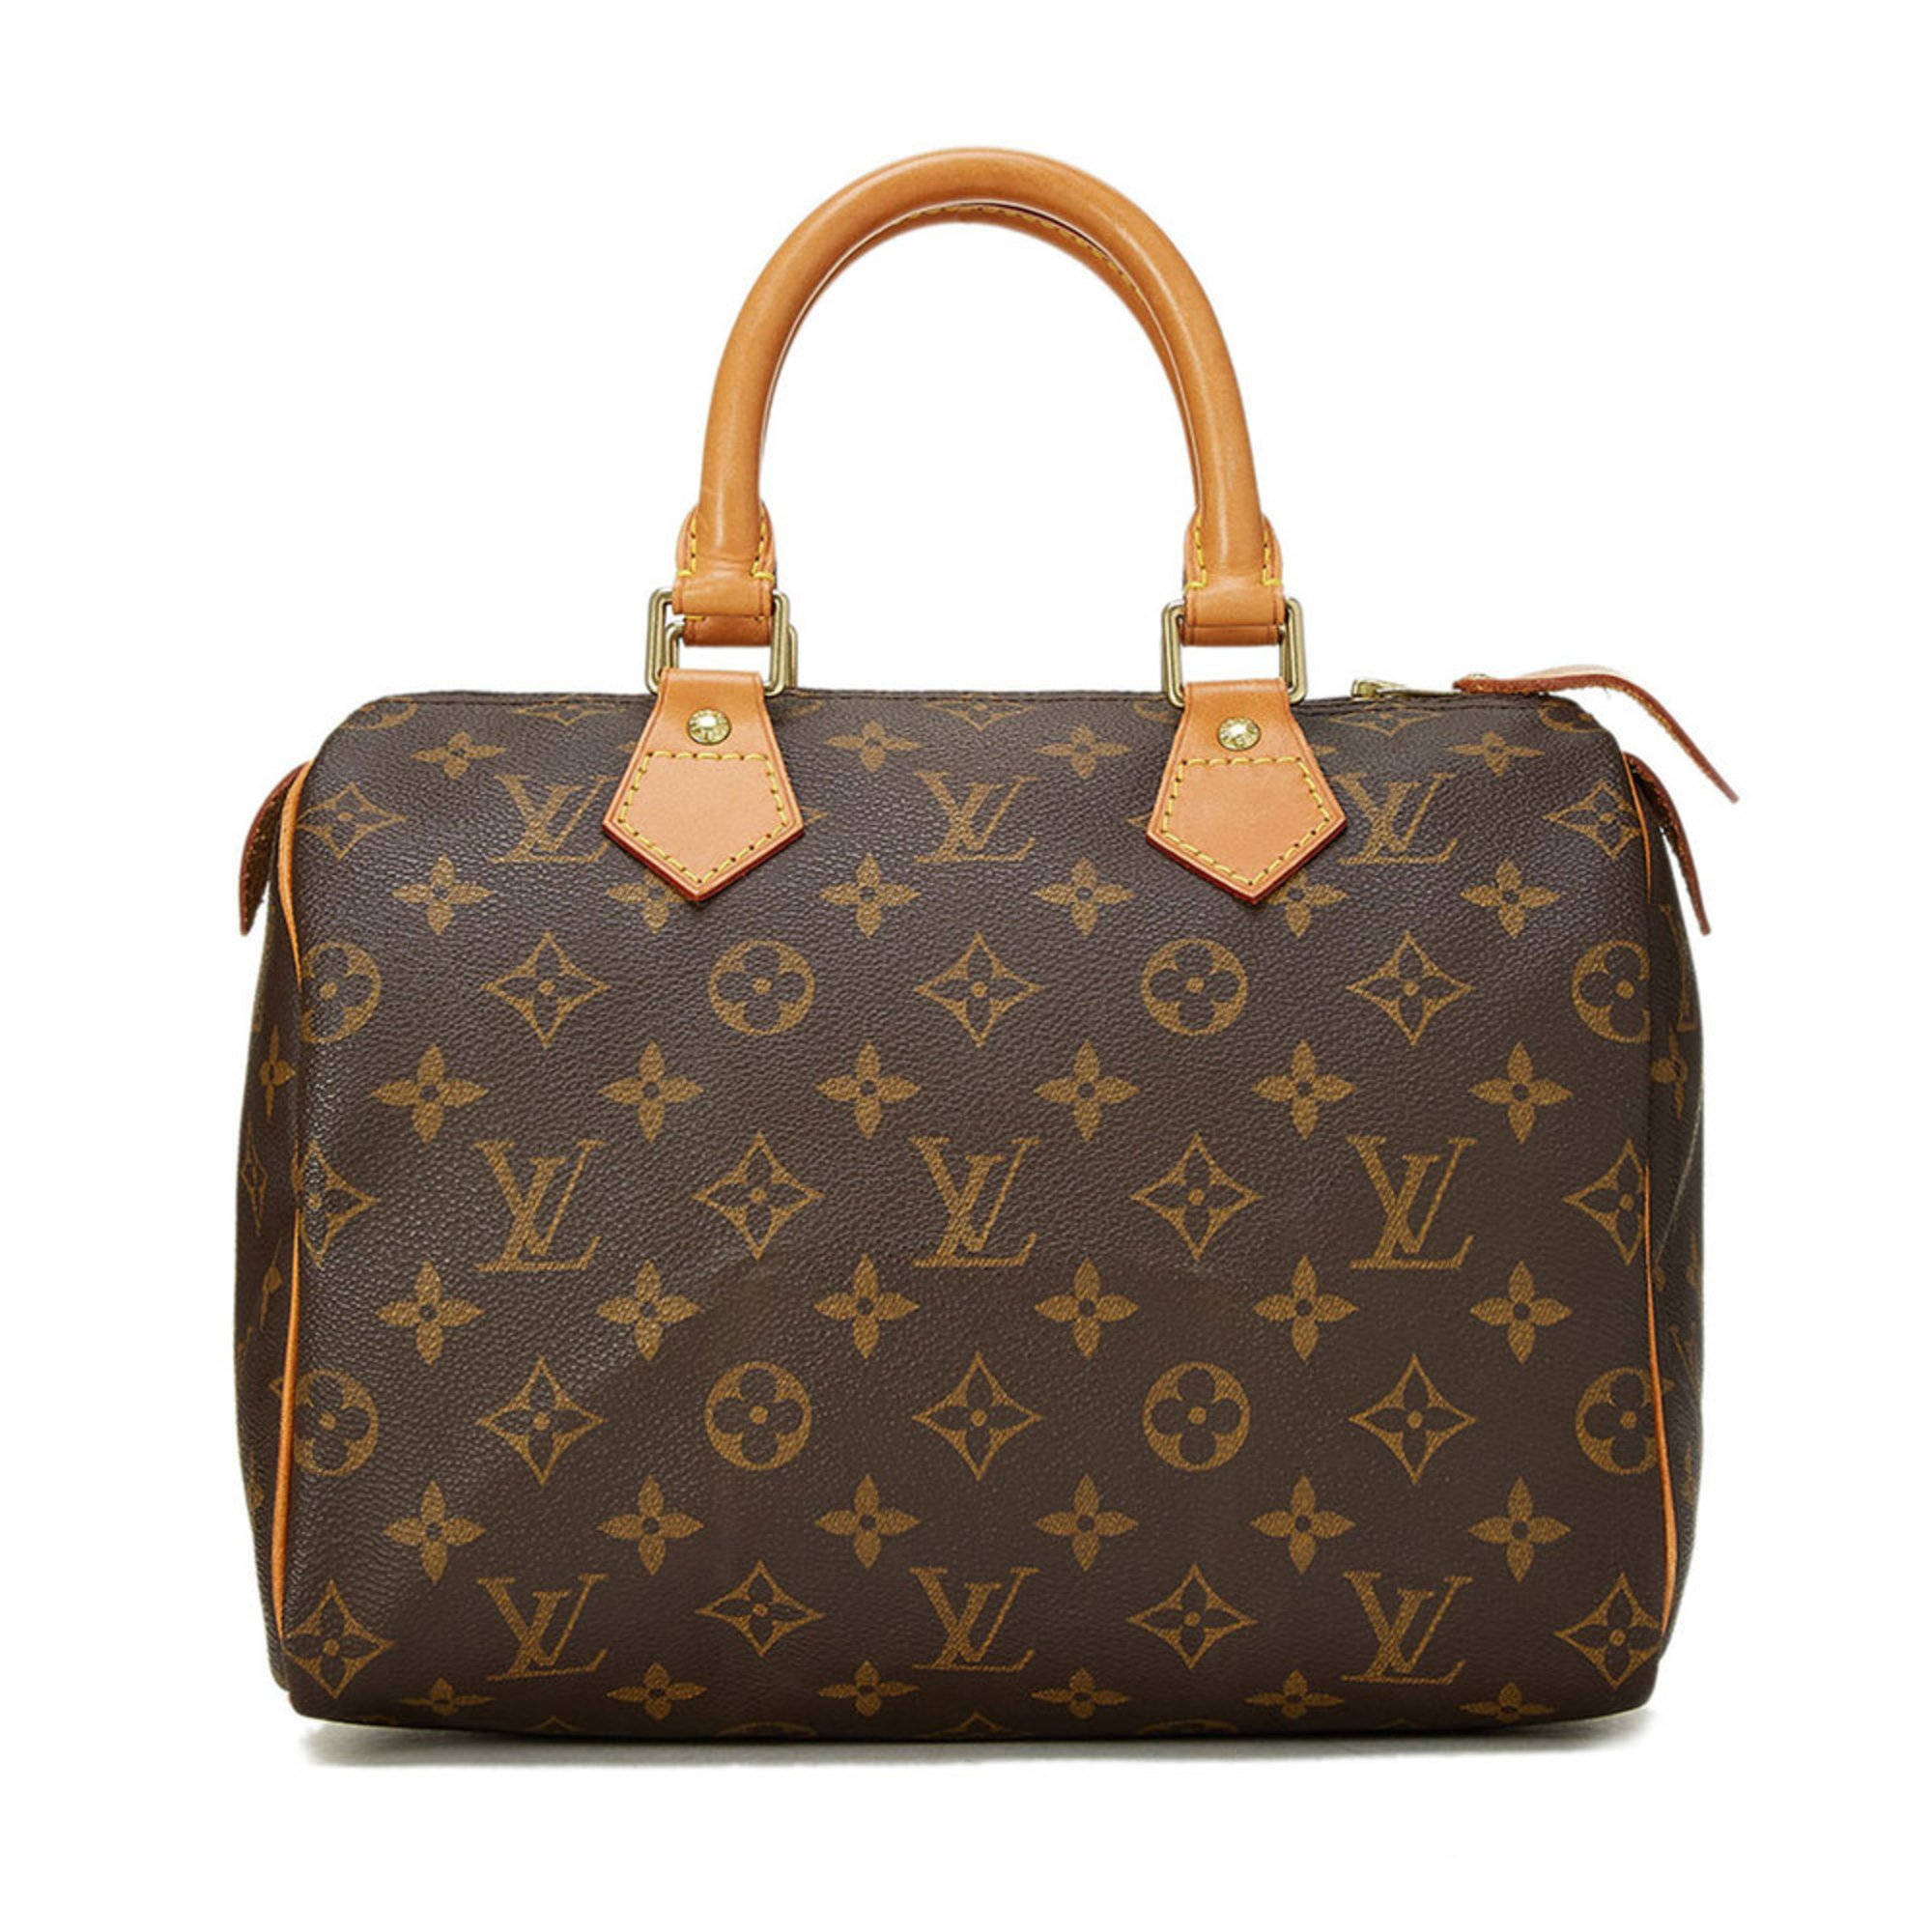 Louis Vuitton. Louis Vuitton Monogram Speedy 25 82ed7b74d